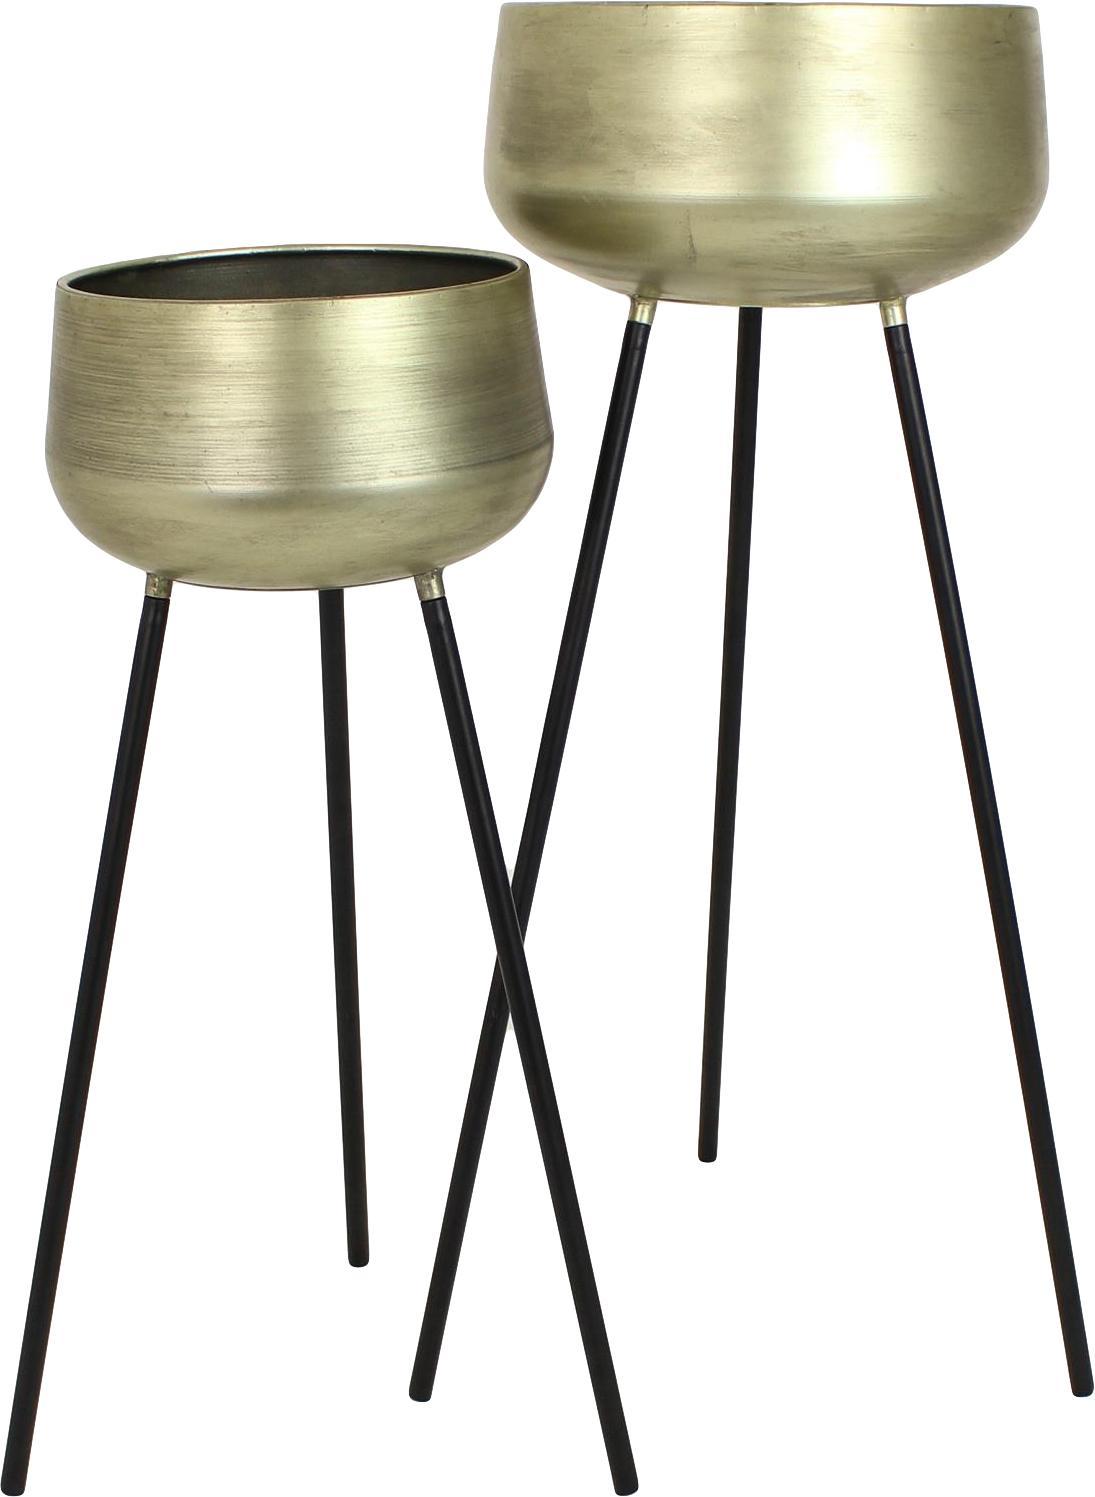 Set 2 portavasi in metallo Chimp, Metallo rivestito, Ottonato, nero, Set in varie misure